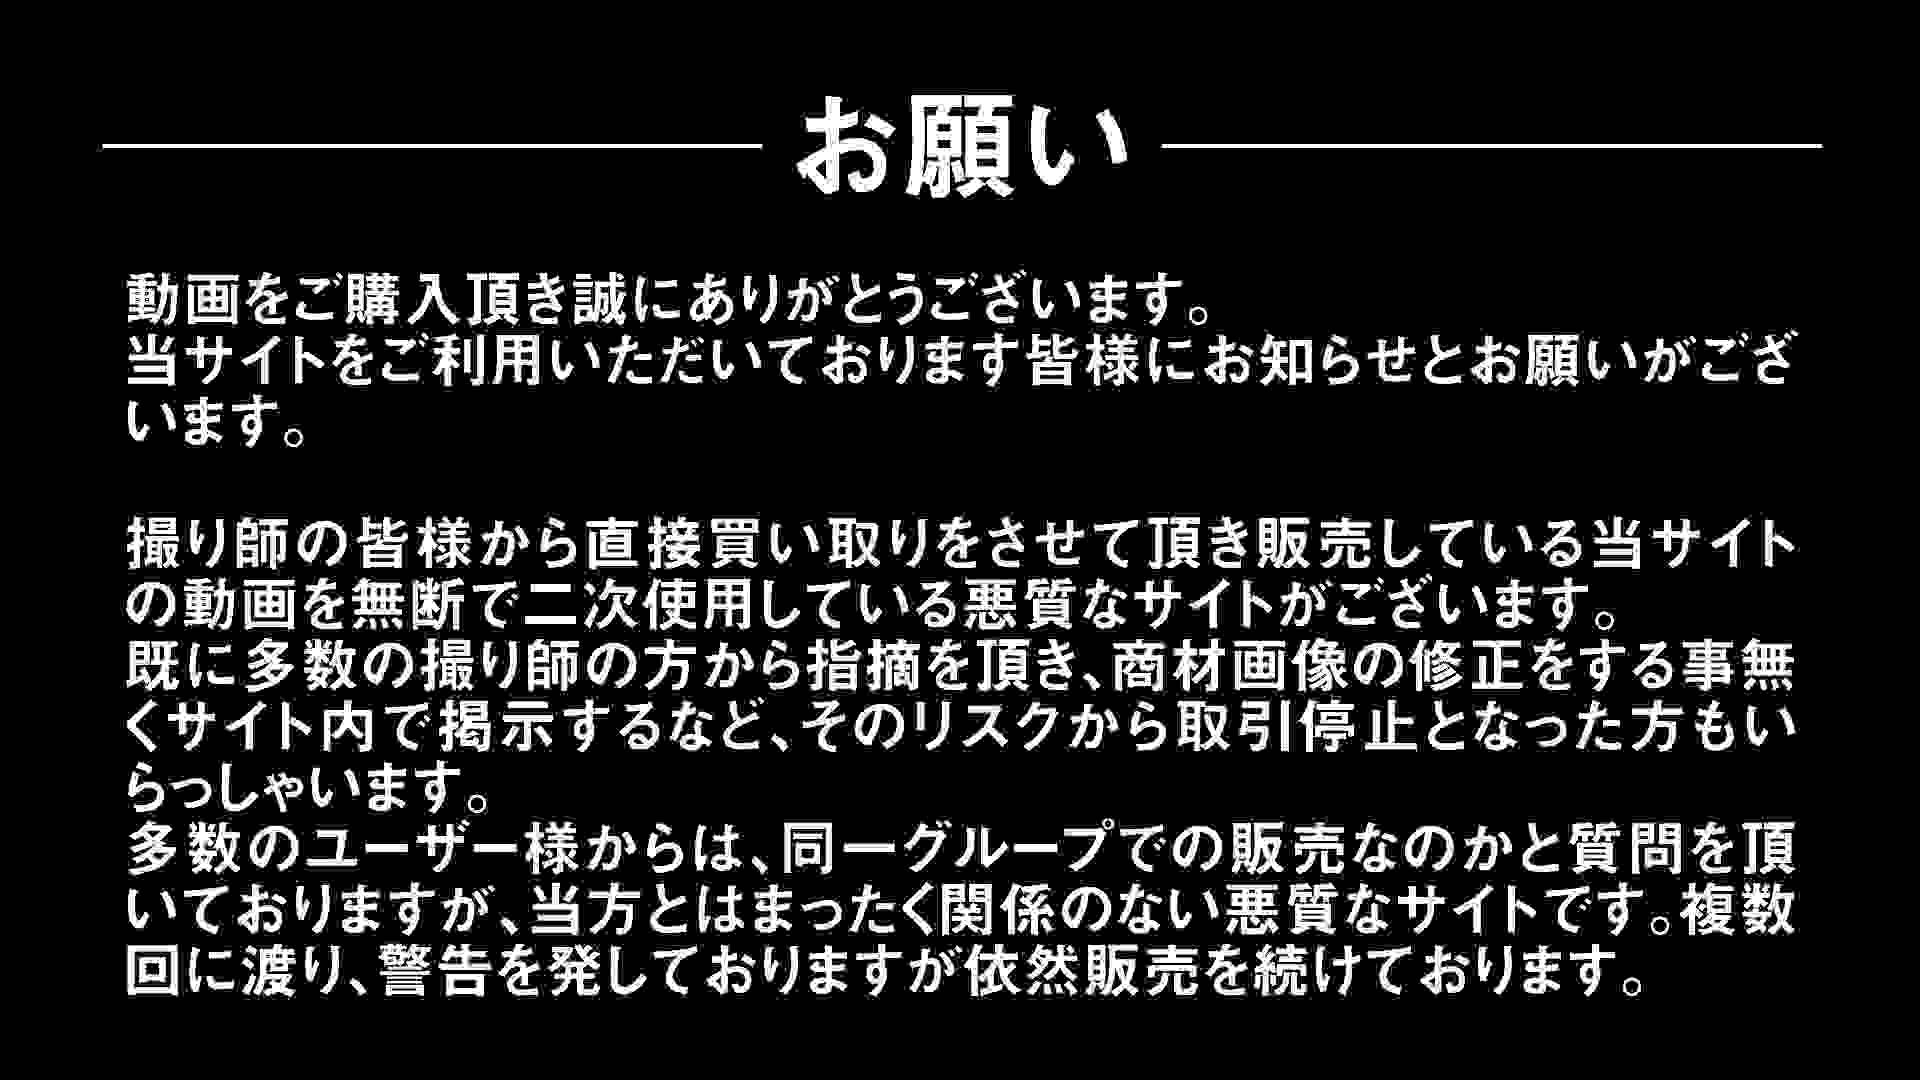 Aquaな露天風呂Vol.300 盗撮シリーズ | 露天風呂編  110PIX 3